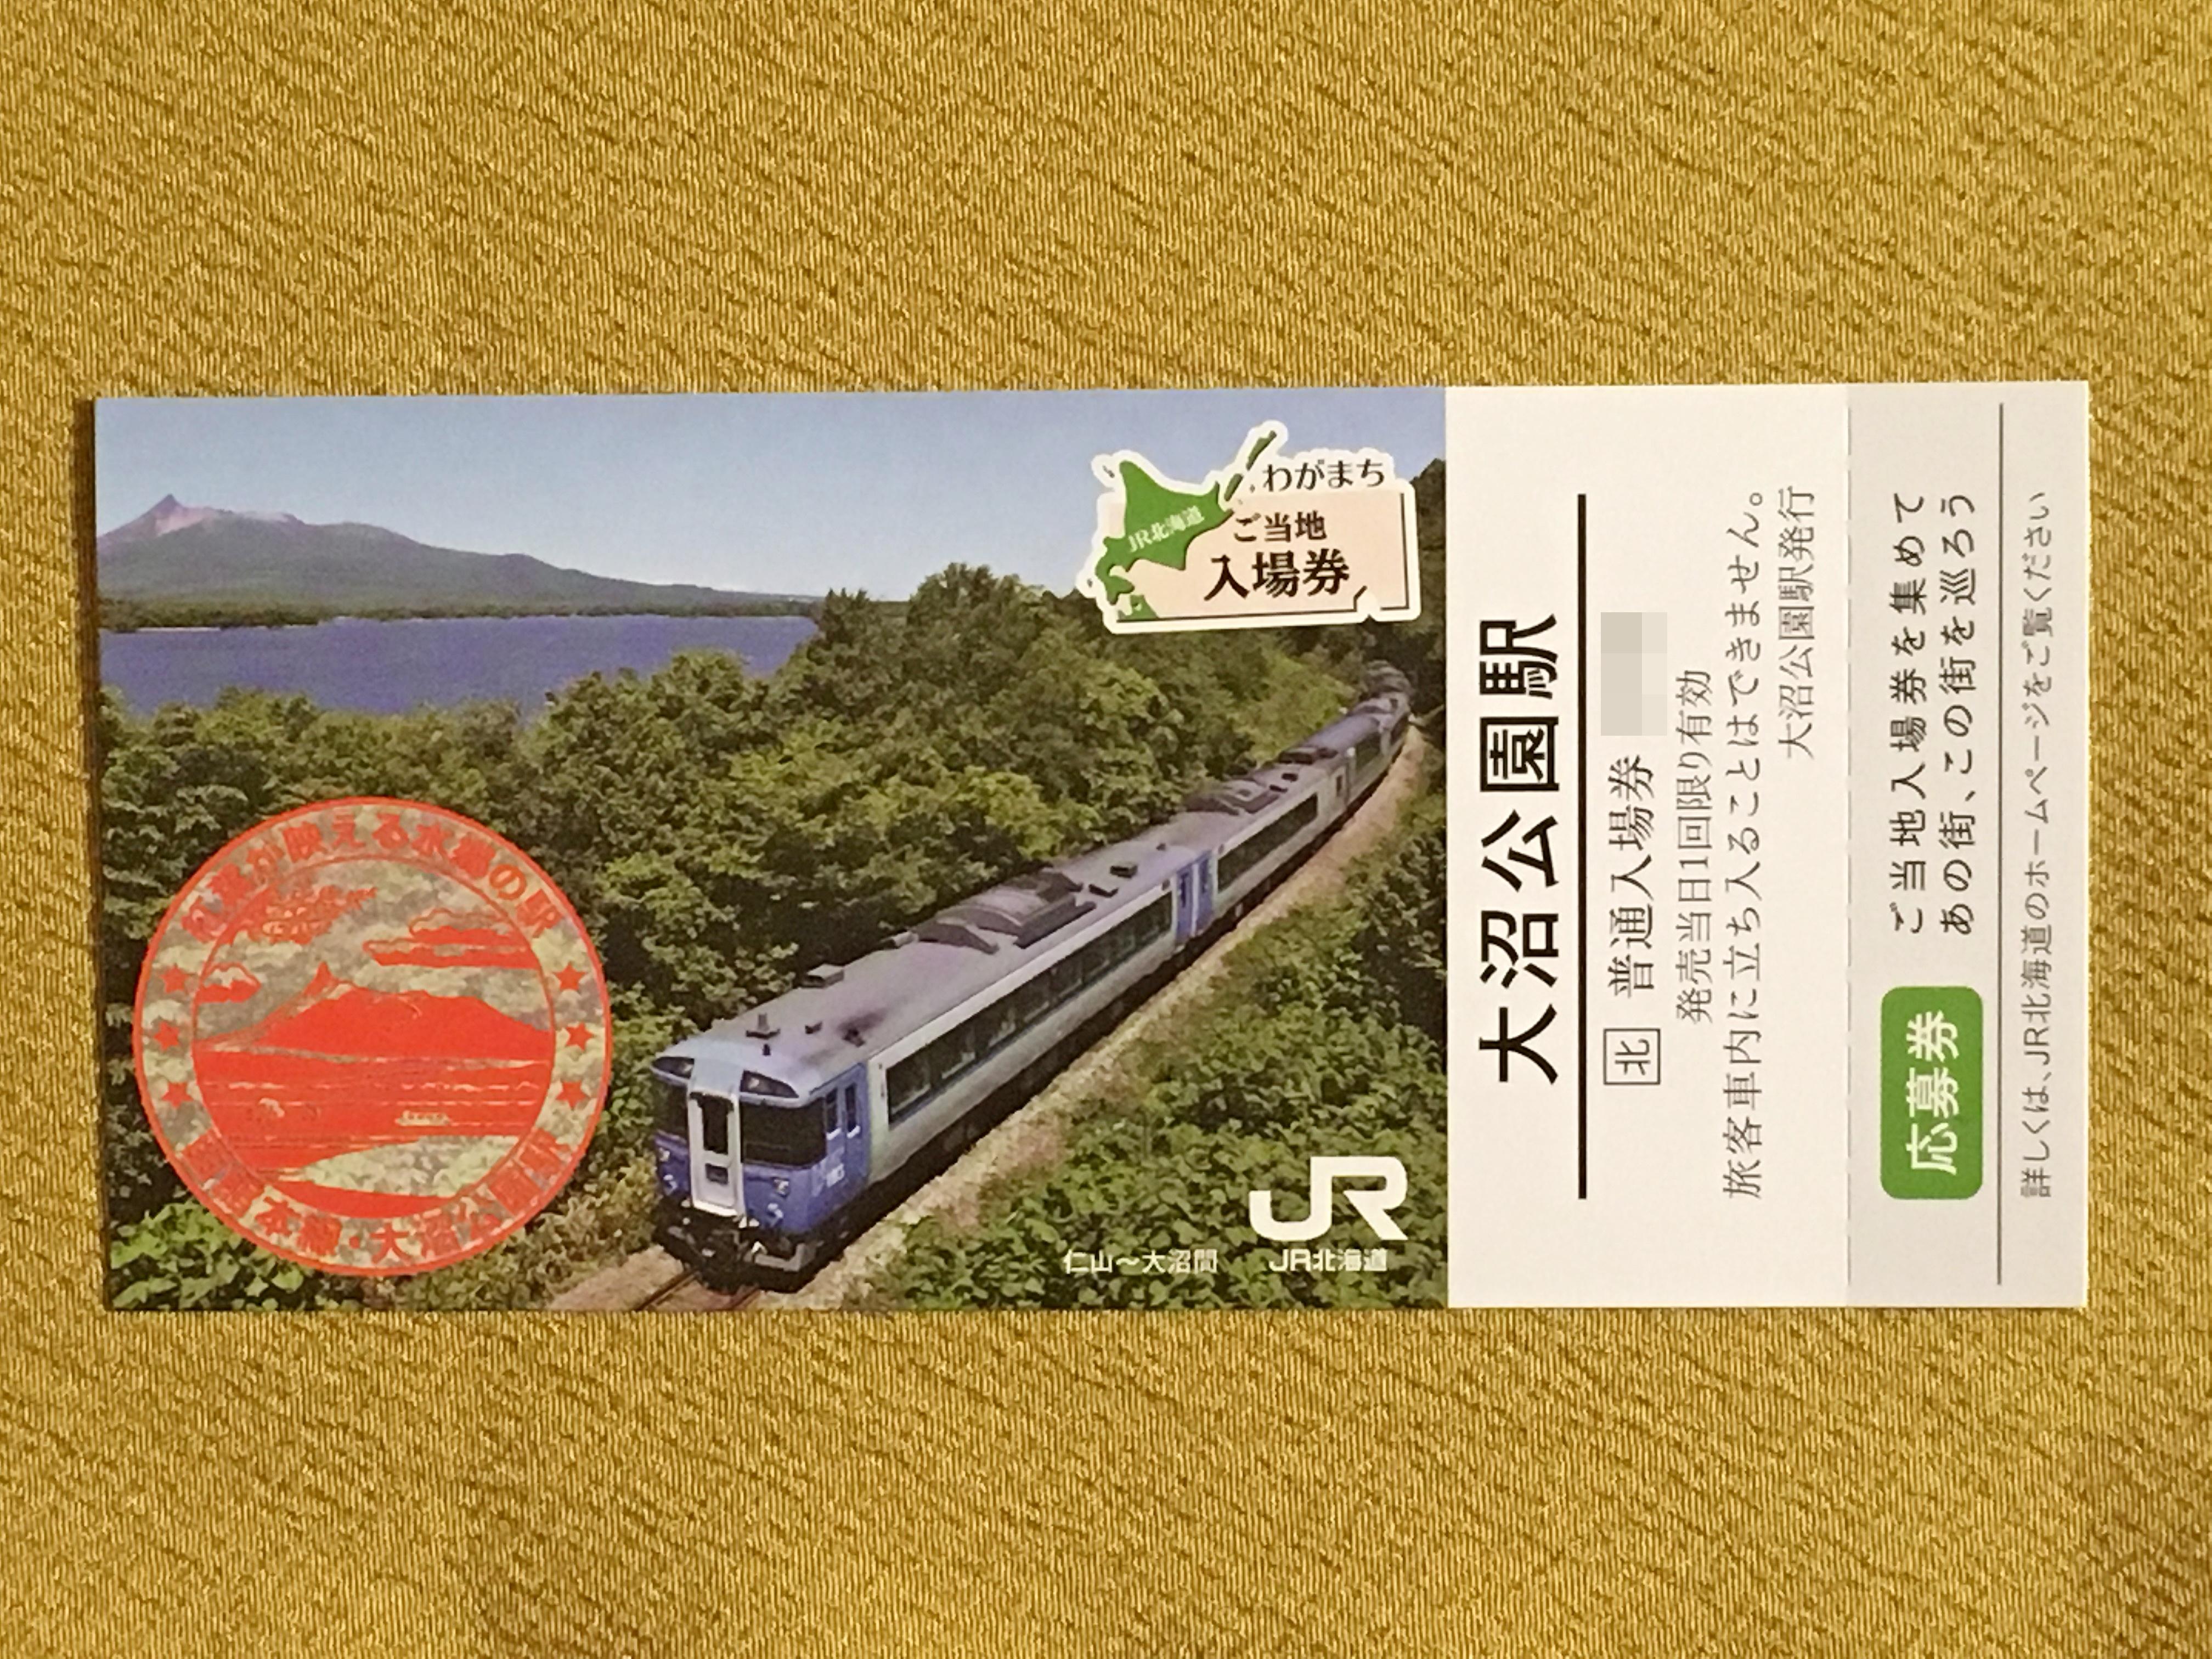 JR北海道ご当地入場券 大沼公園駅表.JPG